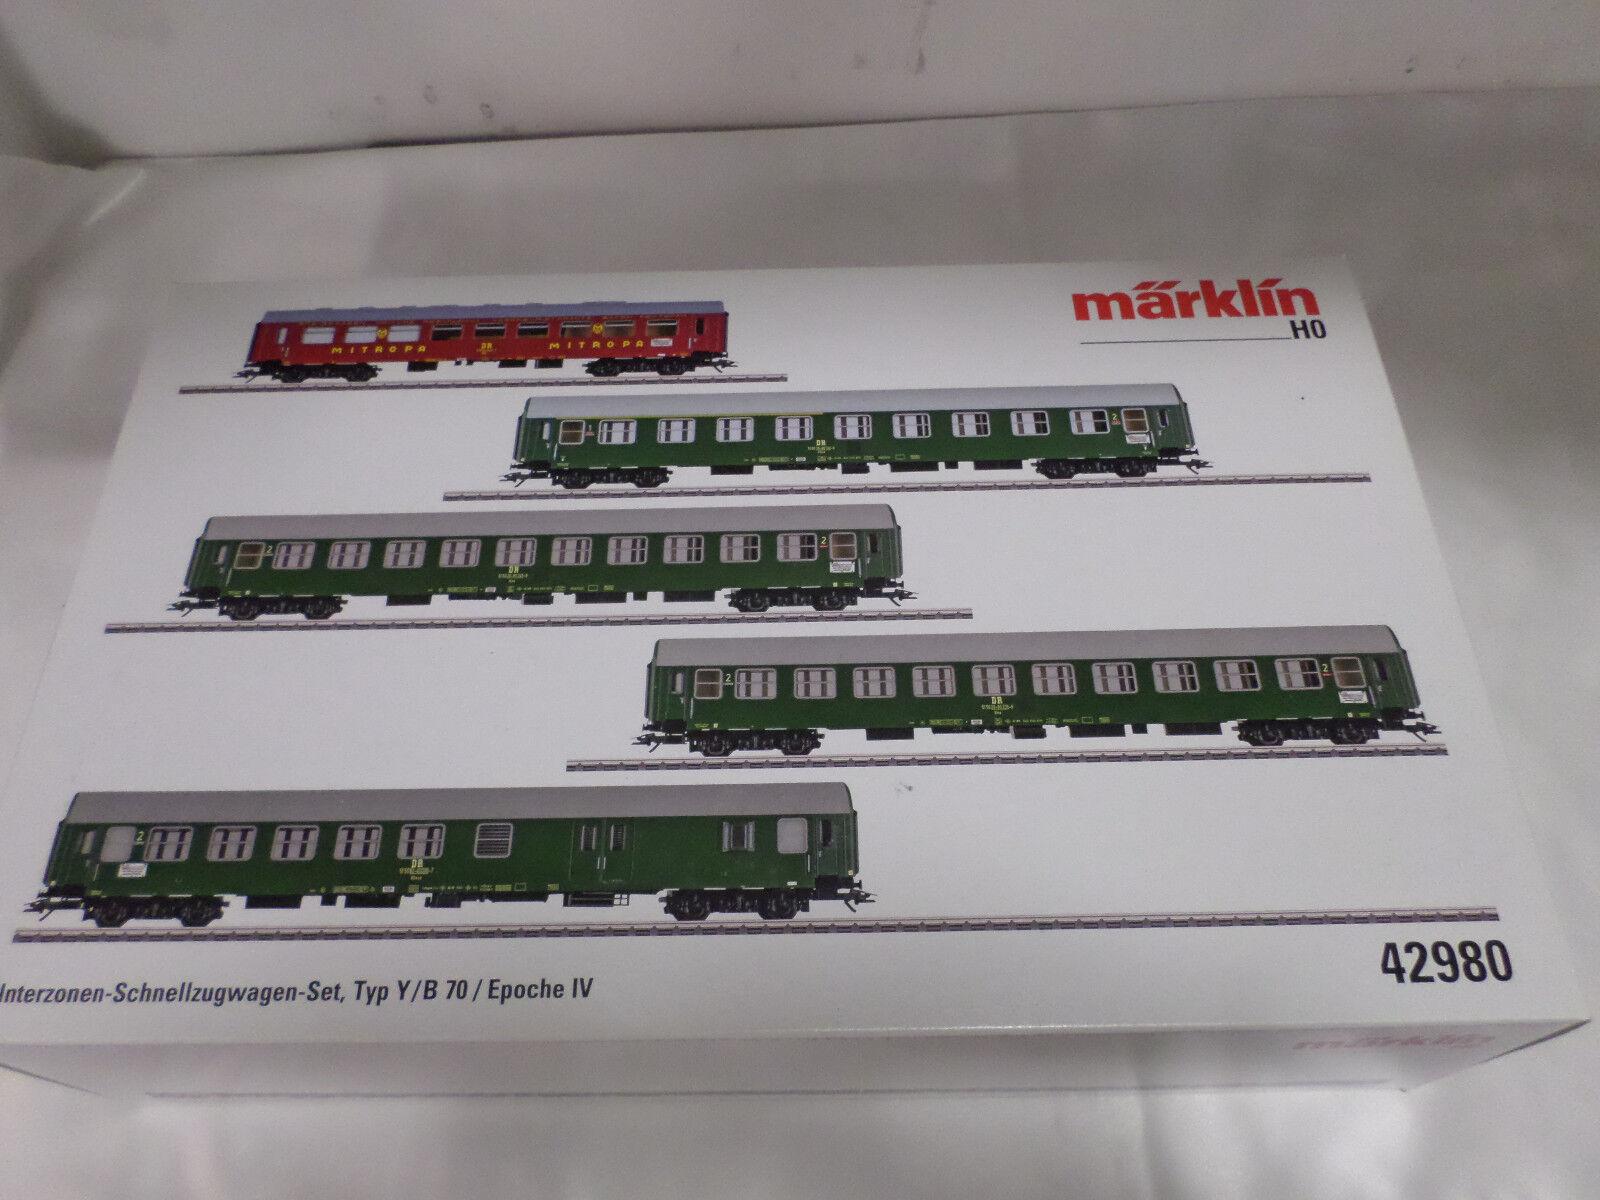 Marklin 42980 HO Inter-Zone Express Train Passenger Car Set, Type Y/B 70.